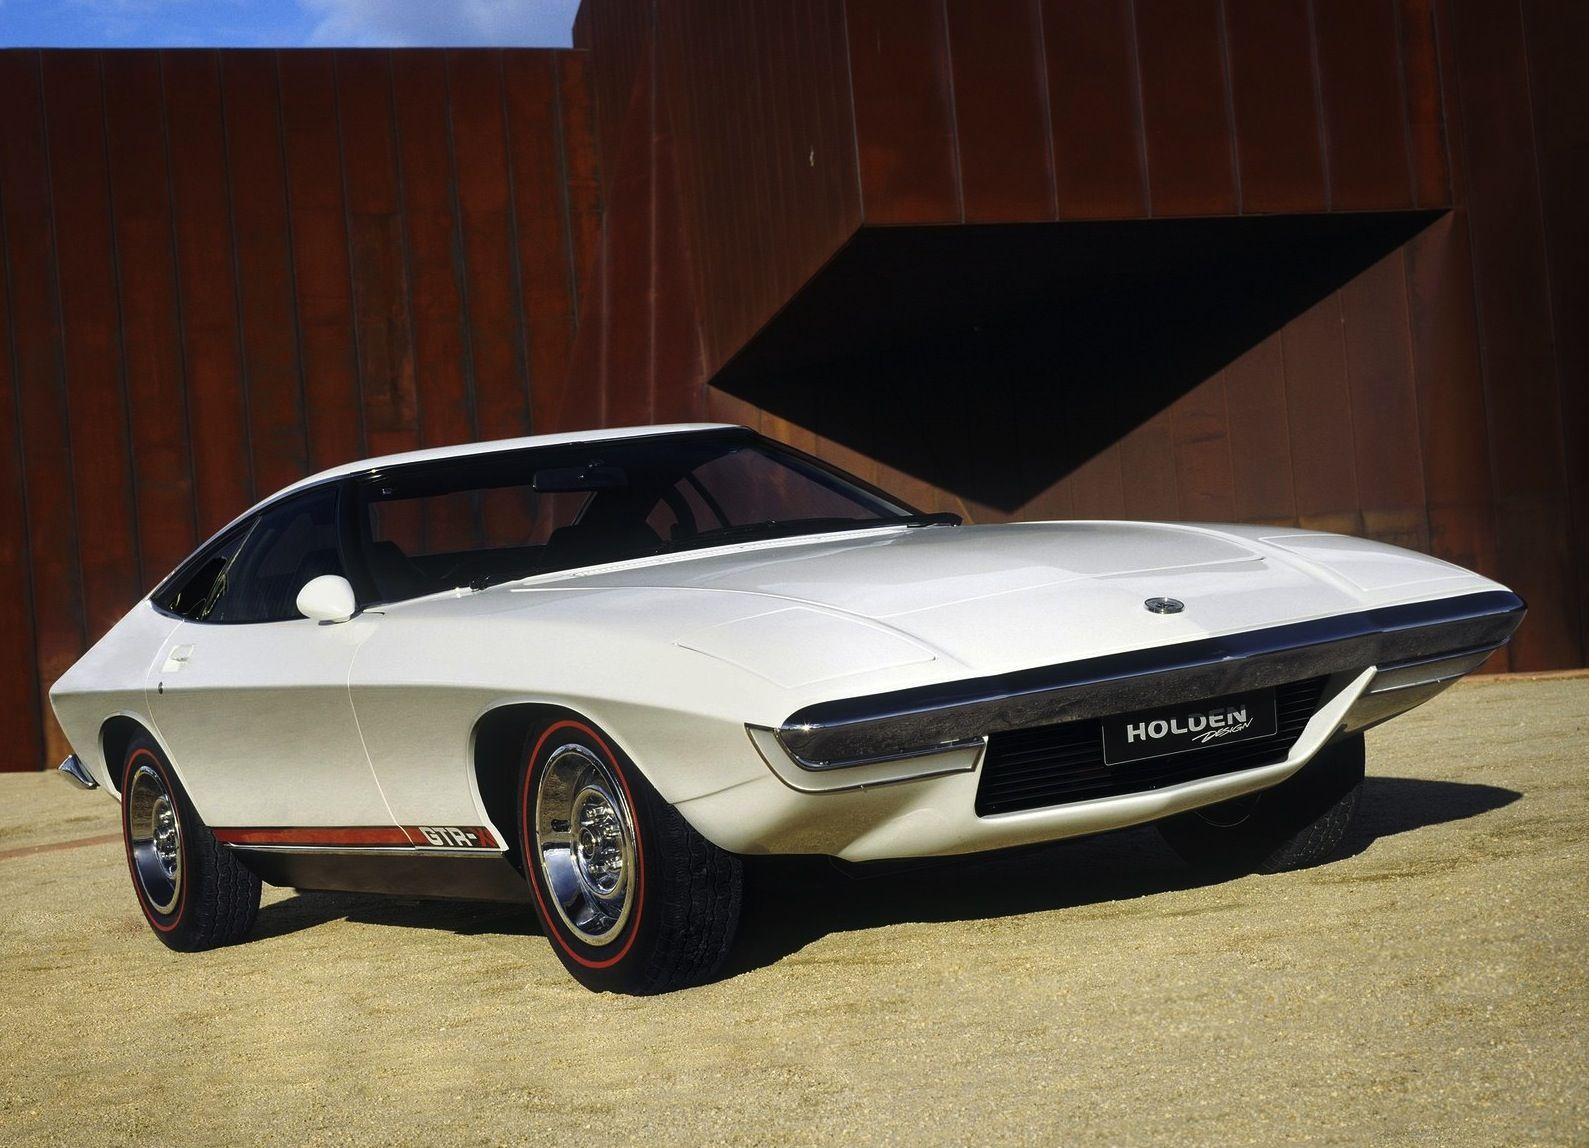 Holden Torana GTR-X Development and Testing | Cars, Vehicle and ...